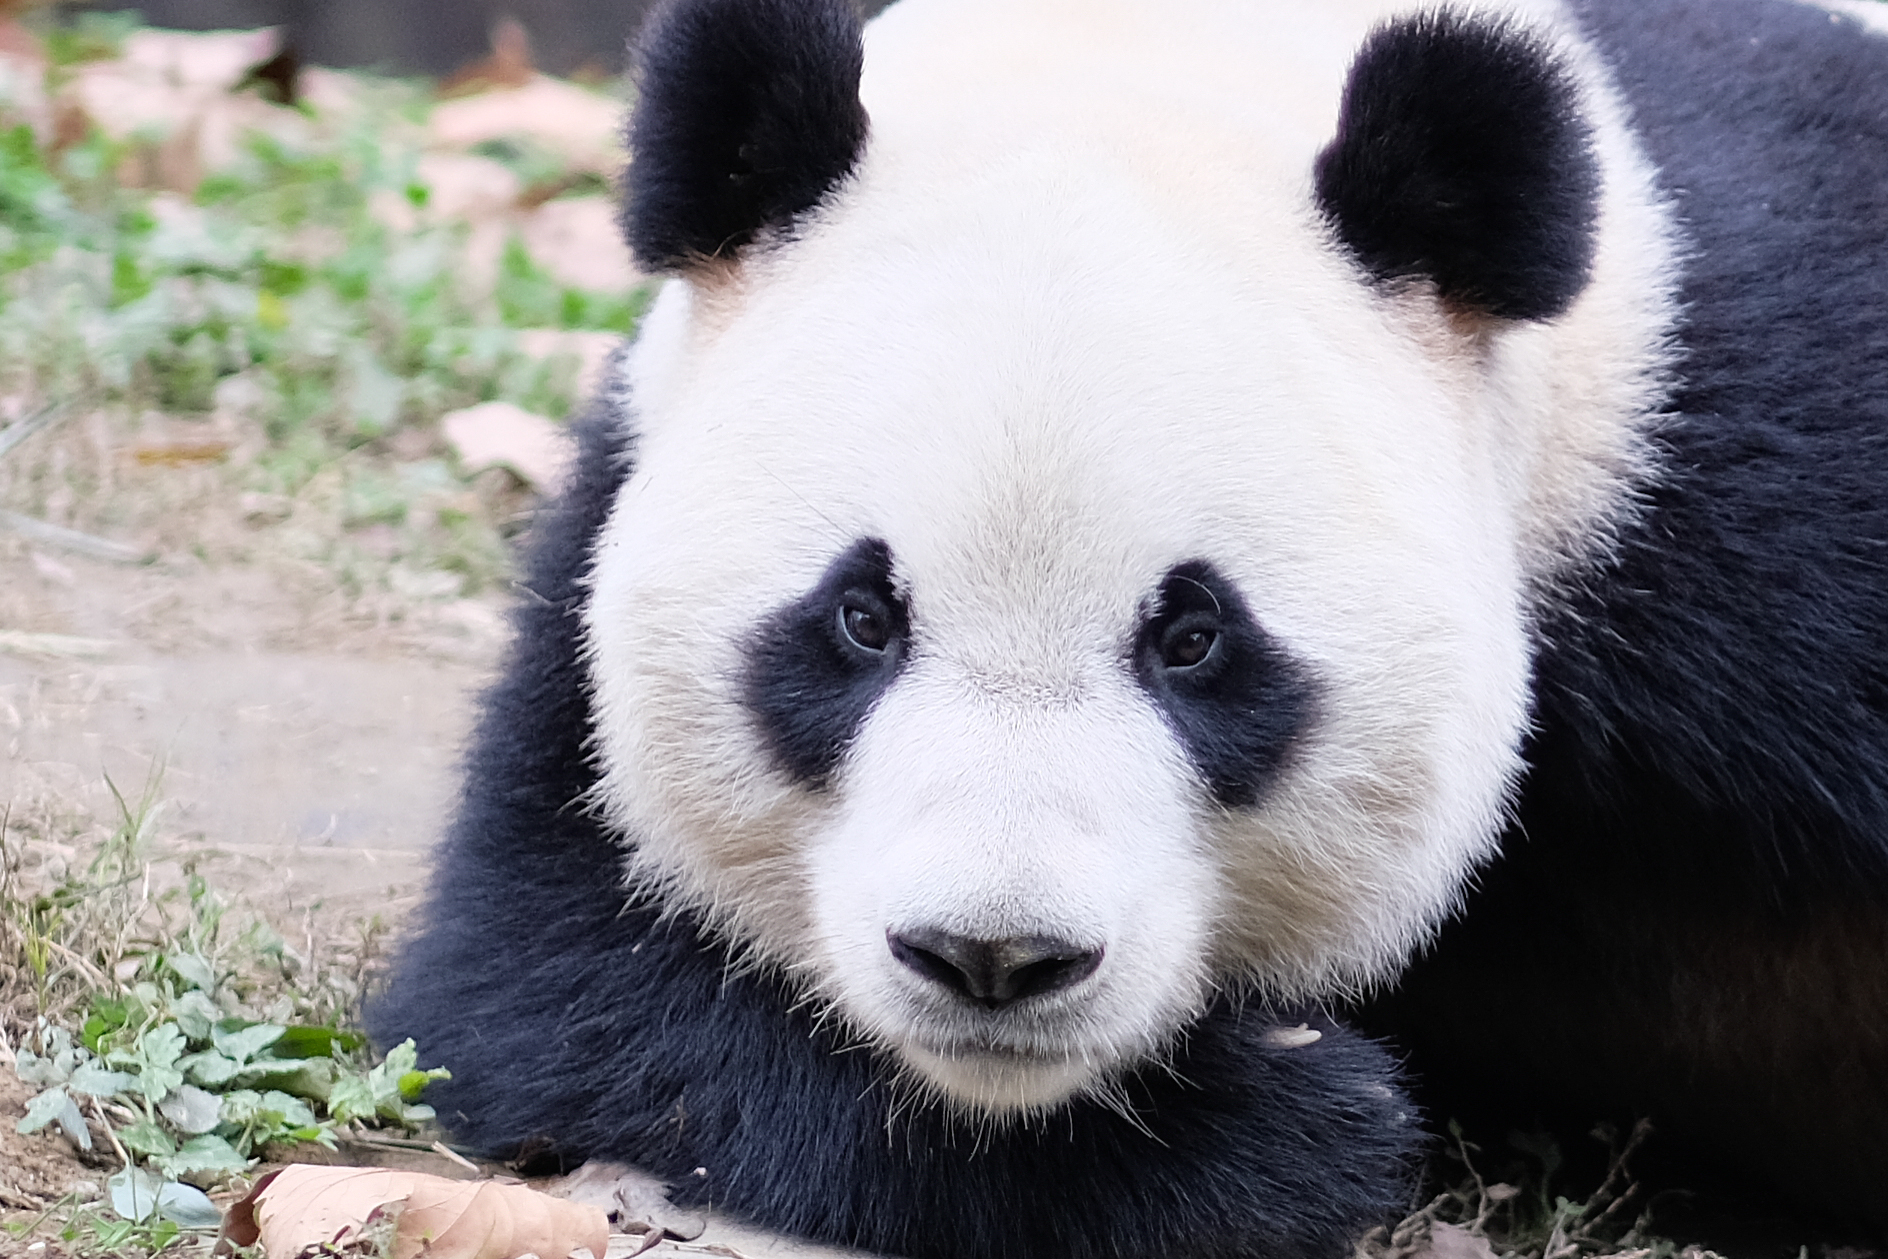 My Dream Job: Panda Keeper At Dujiangyan Panda Base - March 4th, 2018